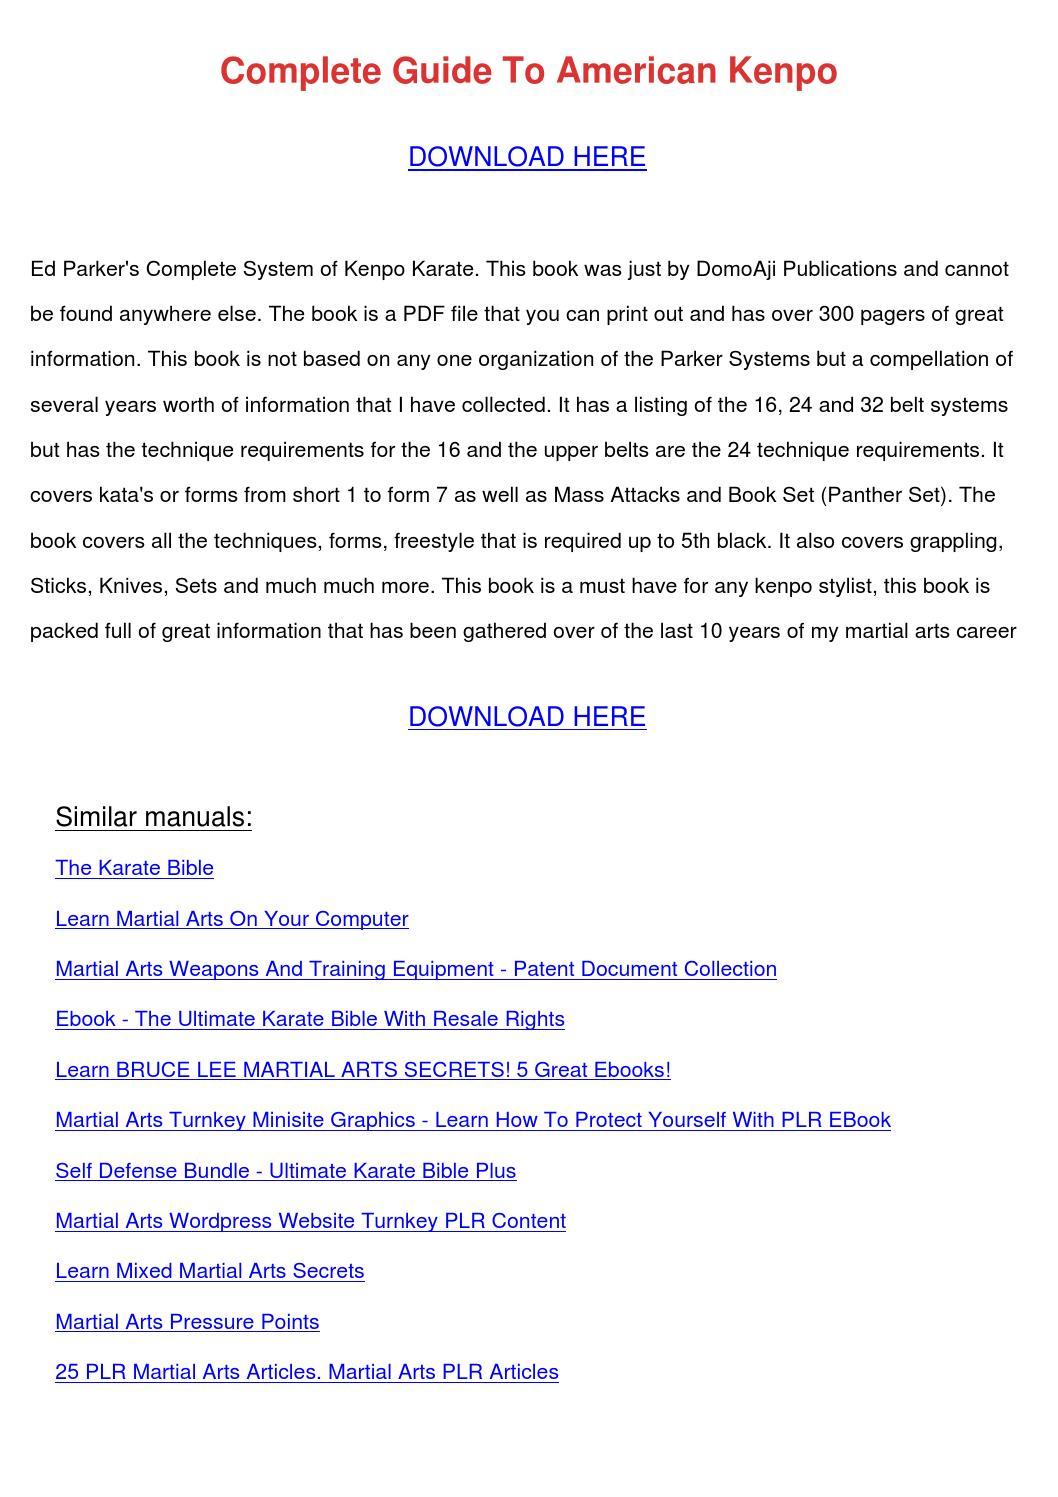 complete guide to american kenpo pdf